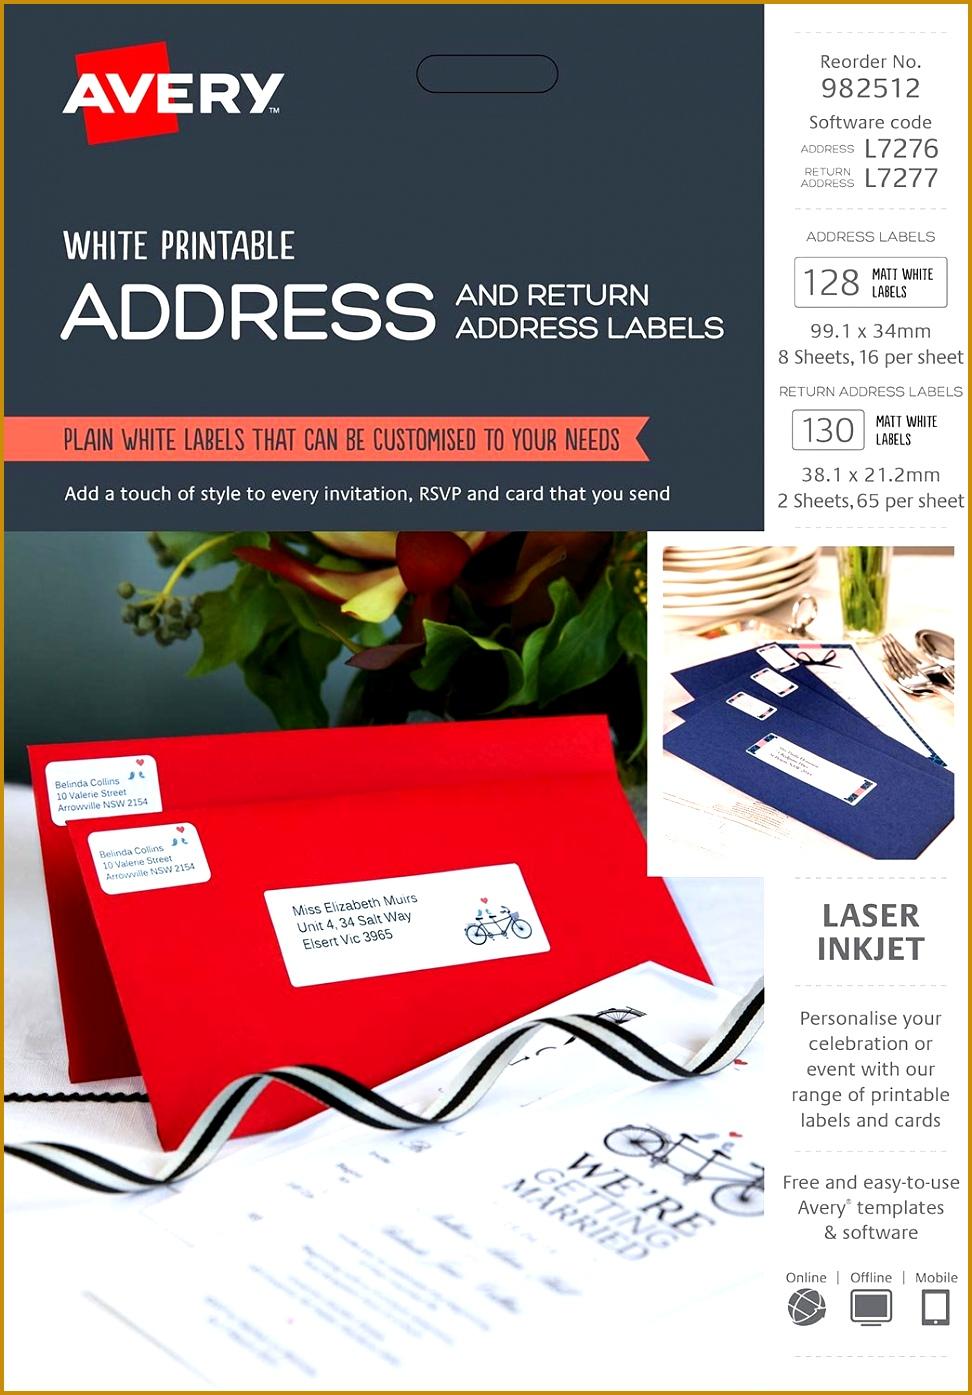 Address Labels Kit 99 1 x 34 mm and 38 1 x 21 2 mm Laser Inkjet 9721395